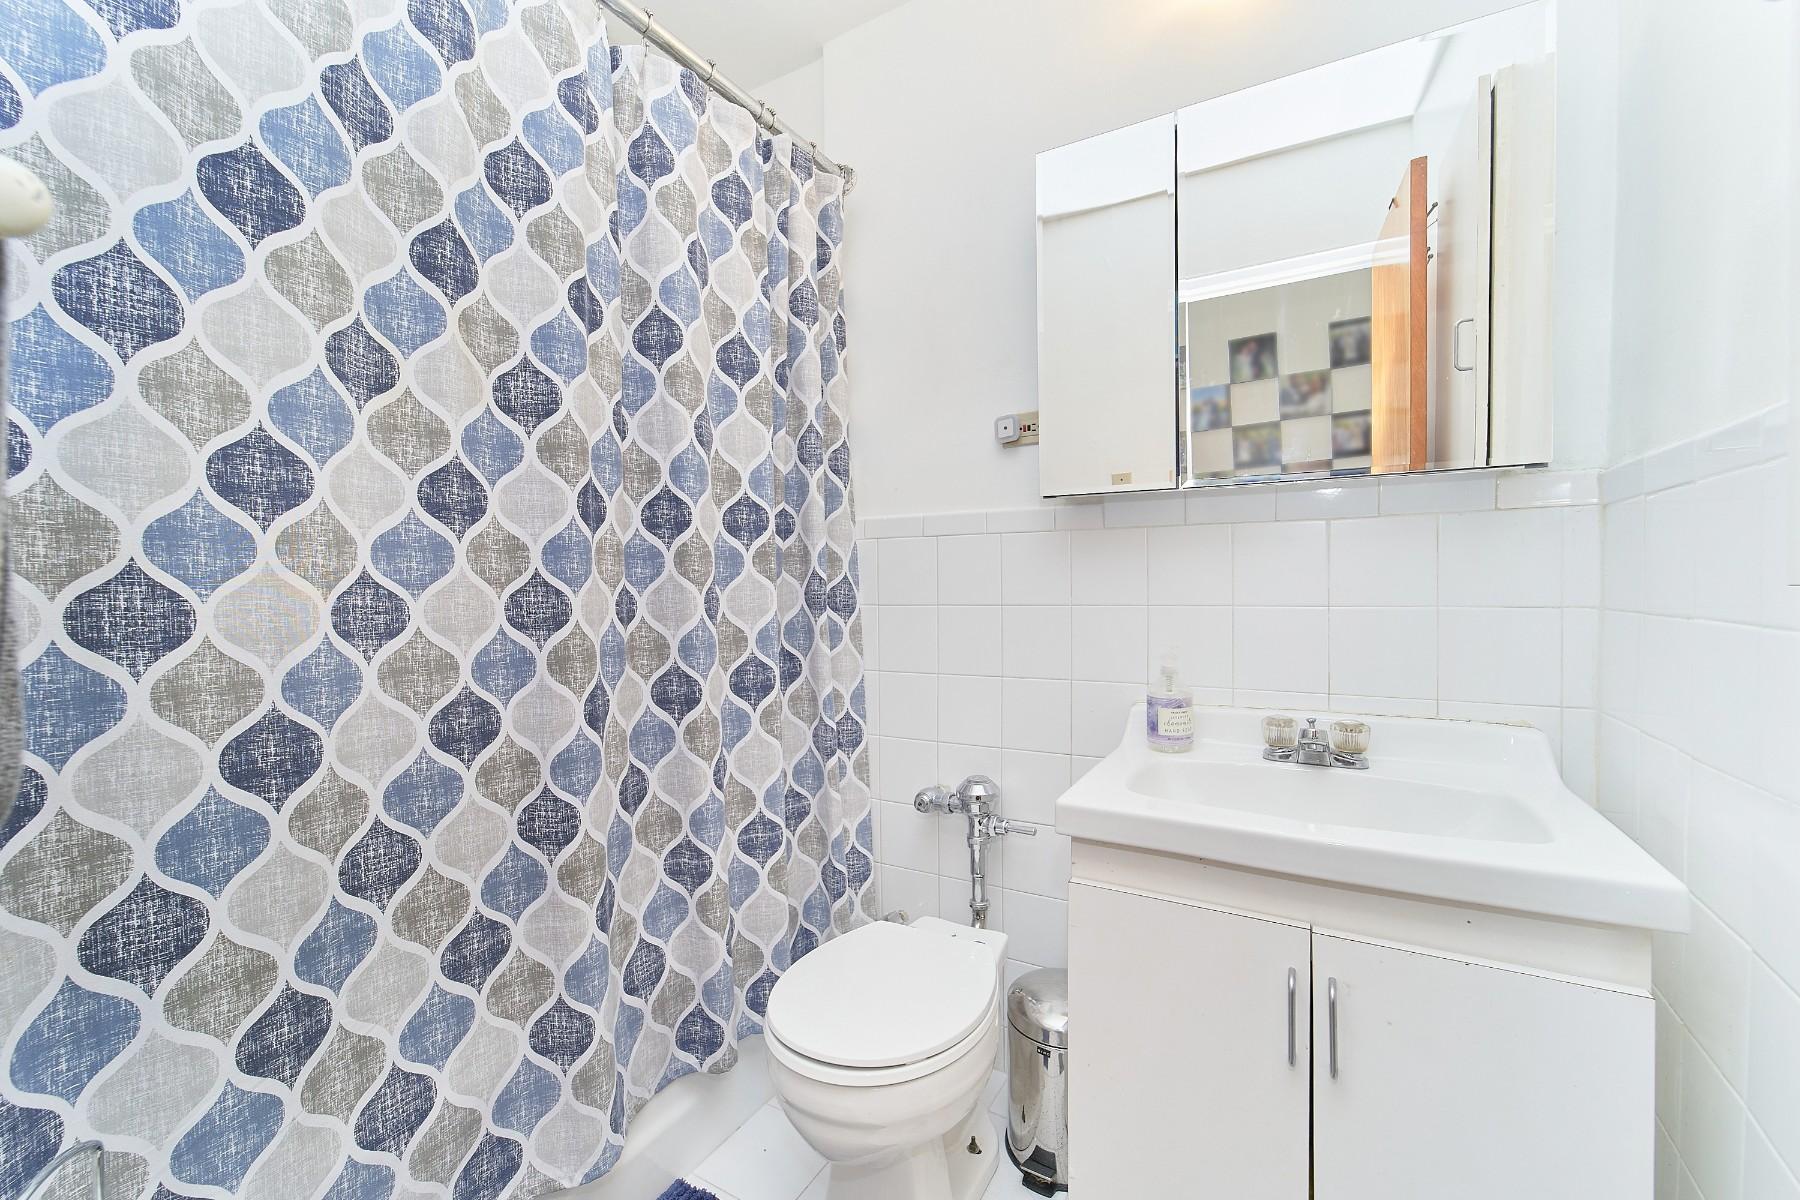 814 Tilden Street Williamsbridge Bronx NY 10467